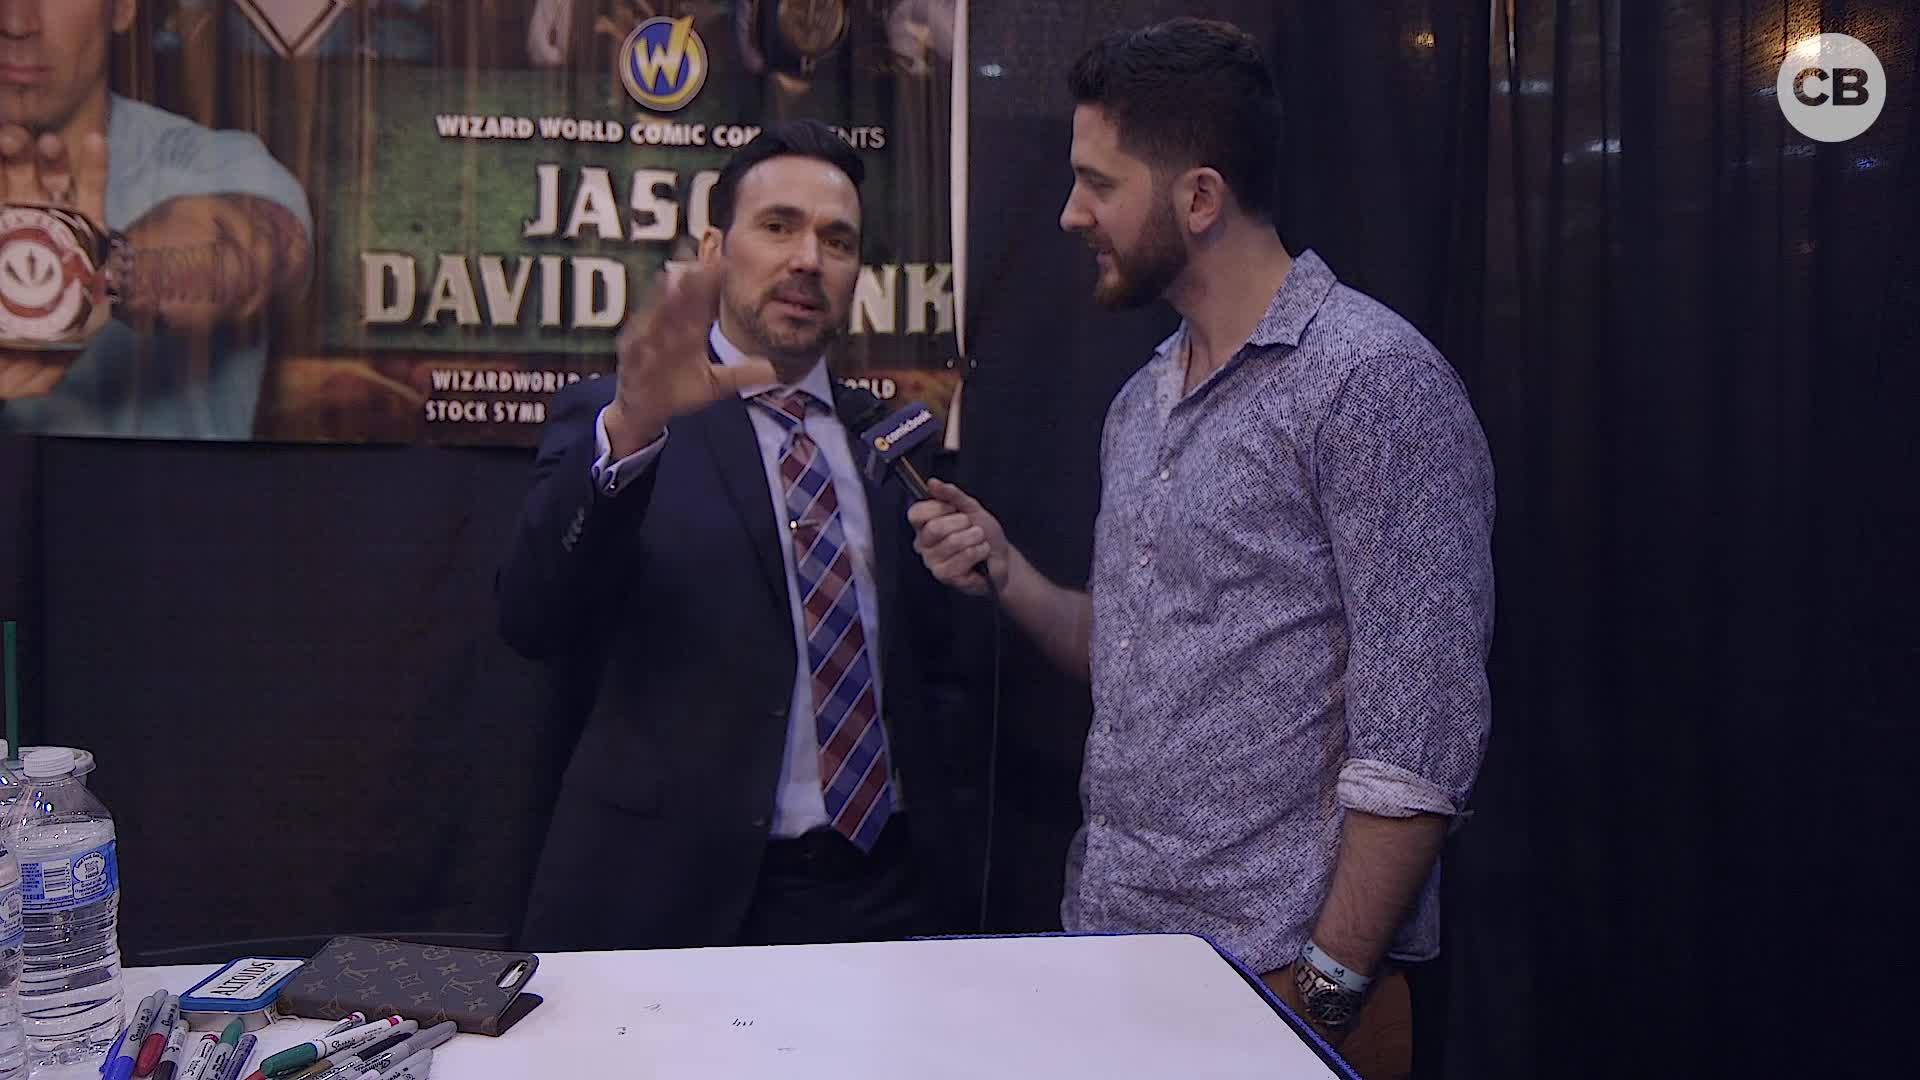 Jason David Frank - Wizard World 2019 Exclusive Interview screen capture